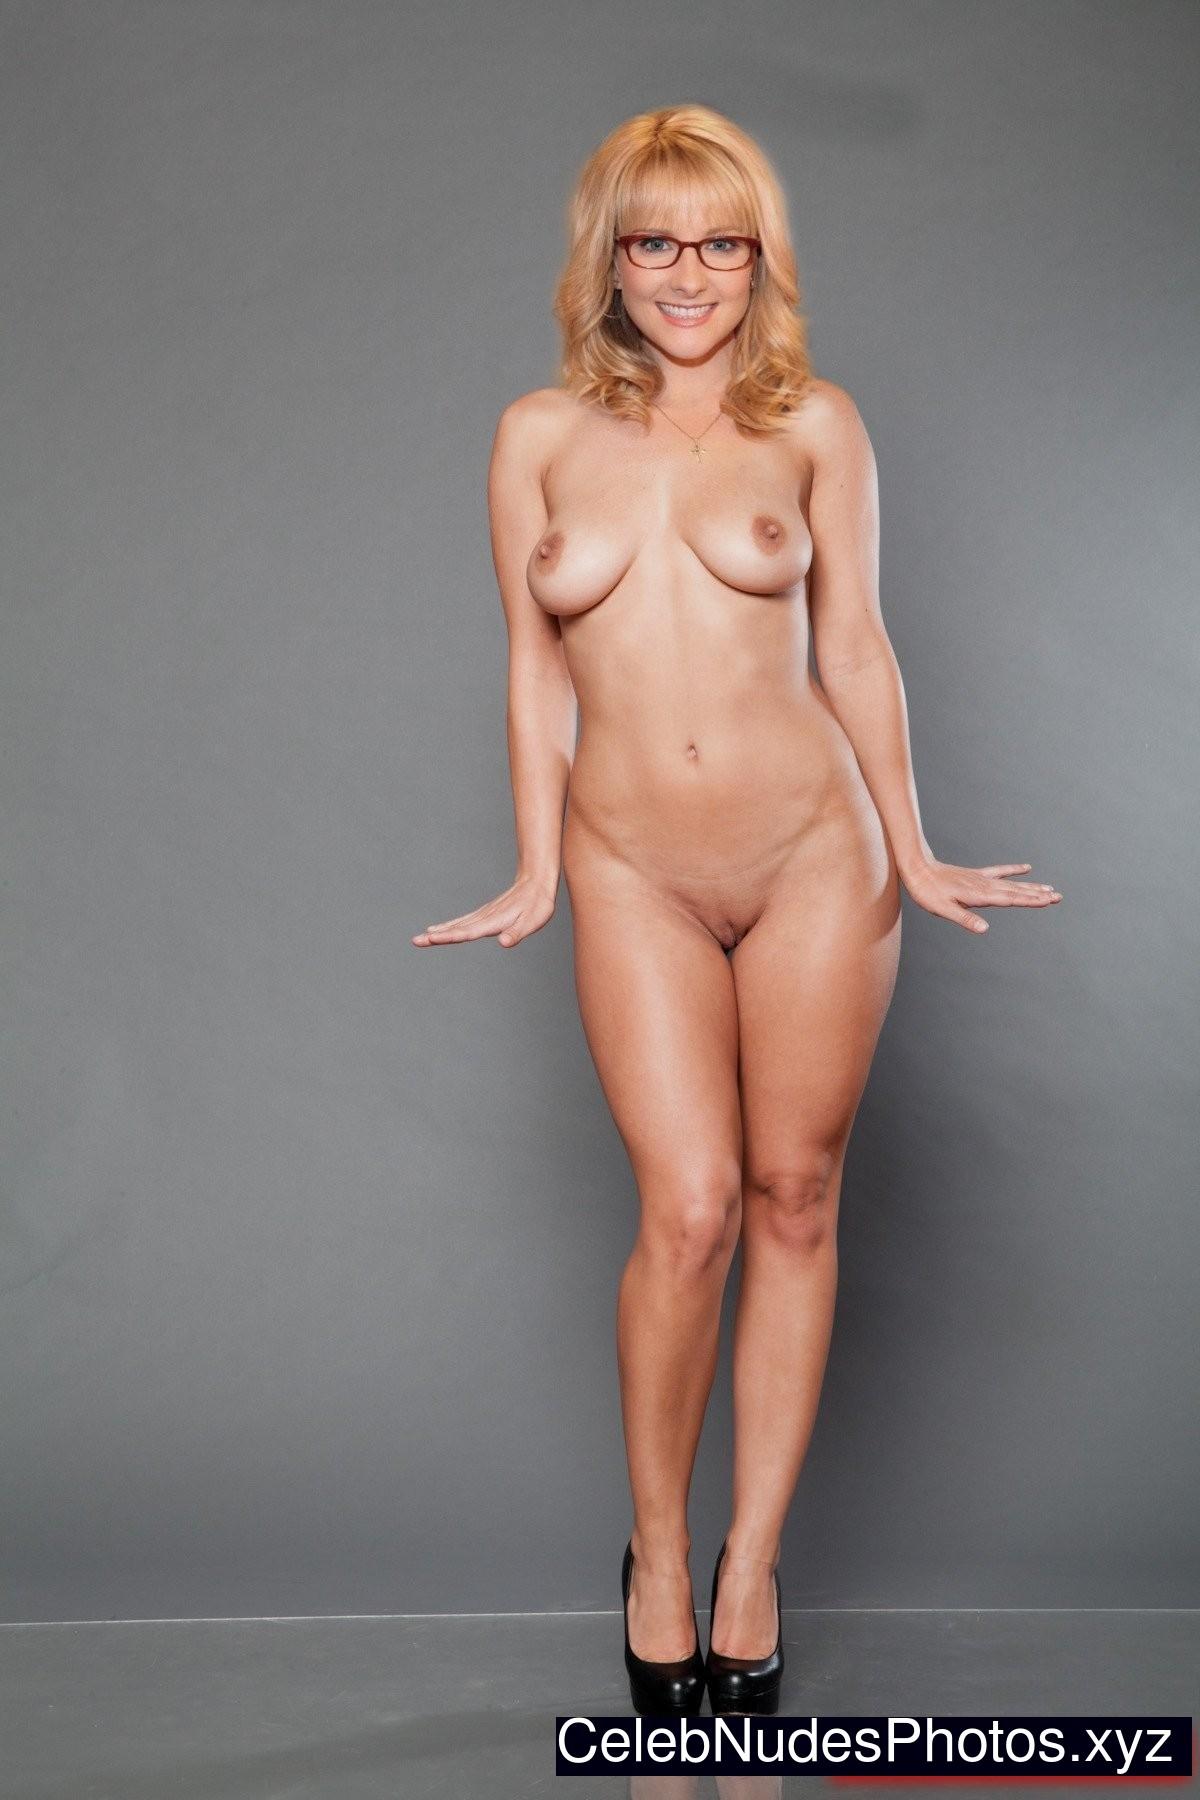 Melissa rauch fake nudes have